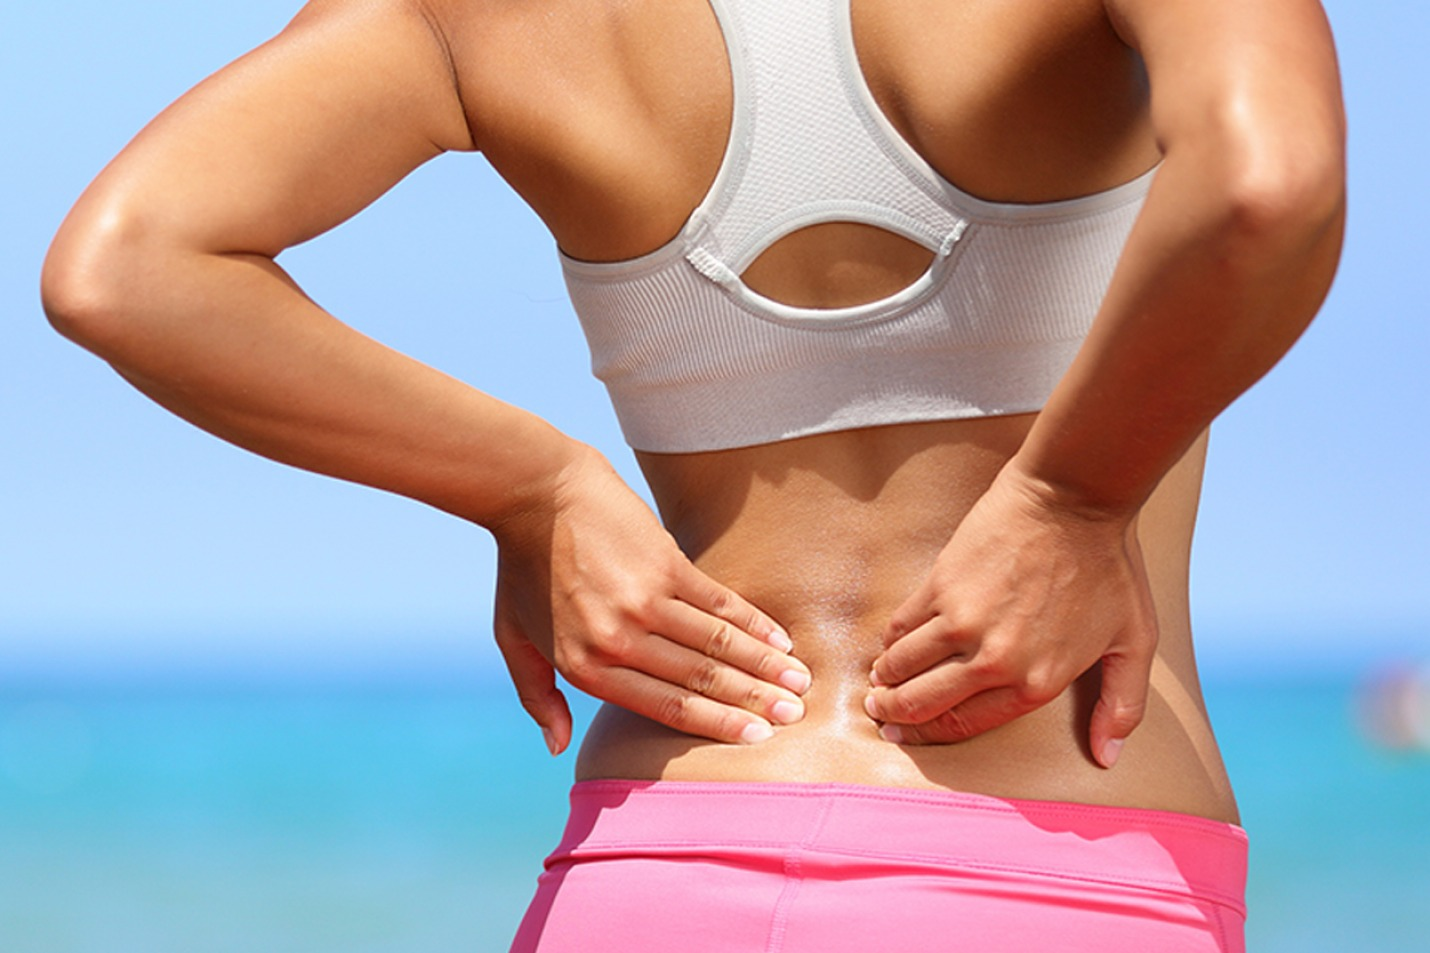 CHOOSING THE RIGHT EXERCISE FOR BANISHING BACK PAIN